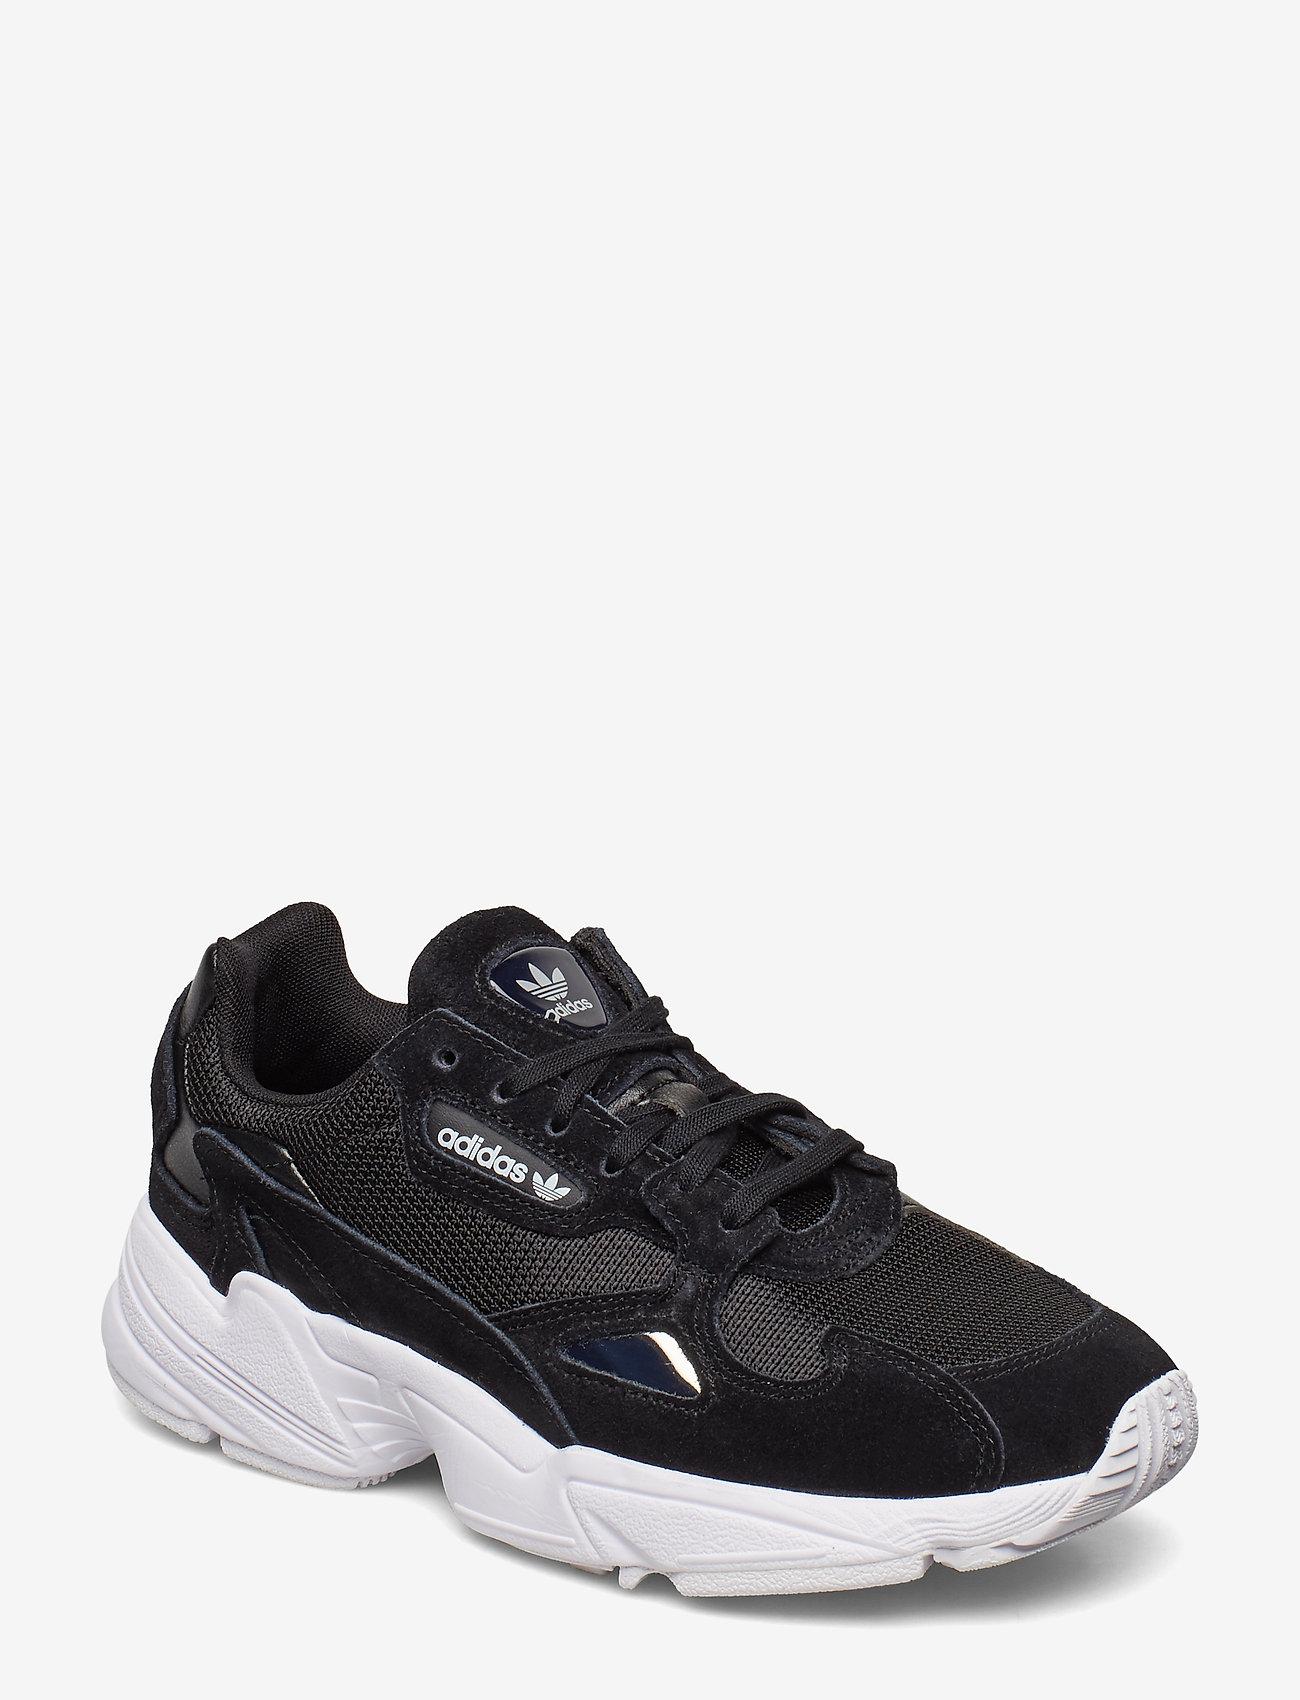 adidas Originals - FALCON W - chunky sneakers - cblack/cblack/ftwwht - 0